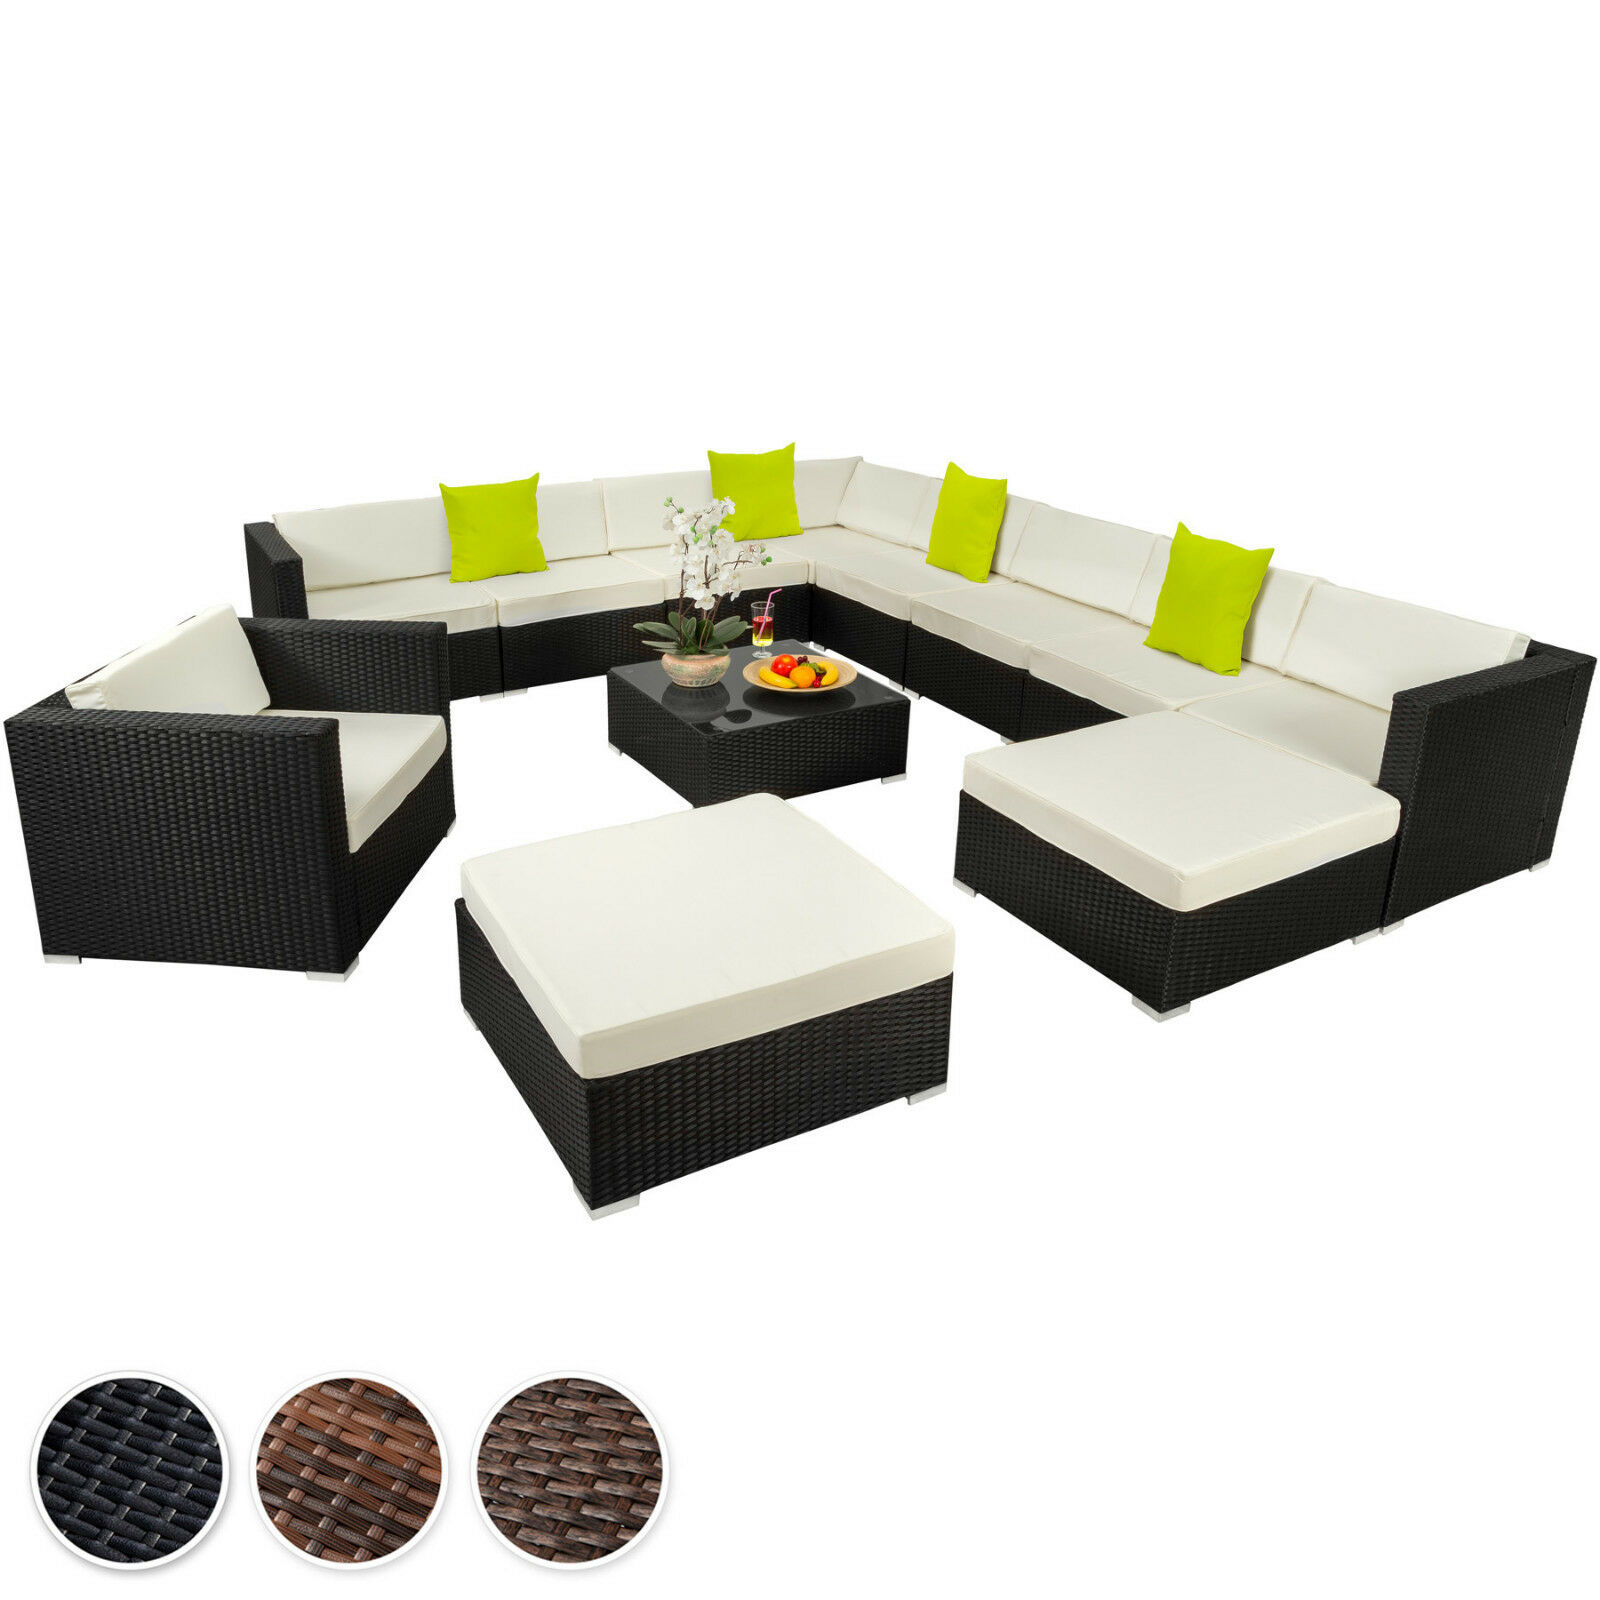 Svita Lugano Polyrattan Lounge Xxl Gartenmobel Set